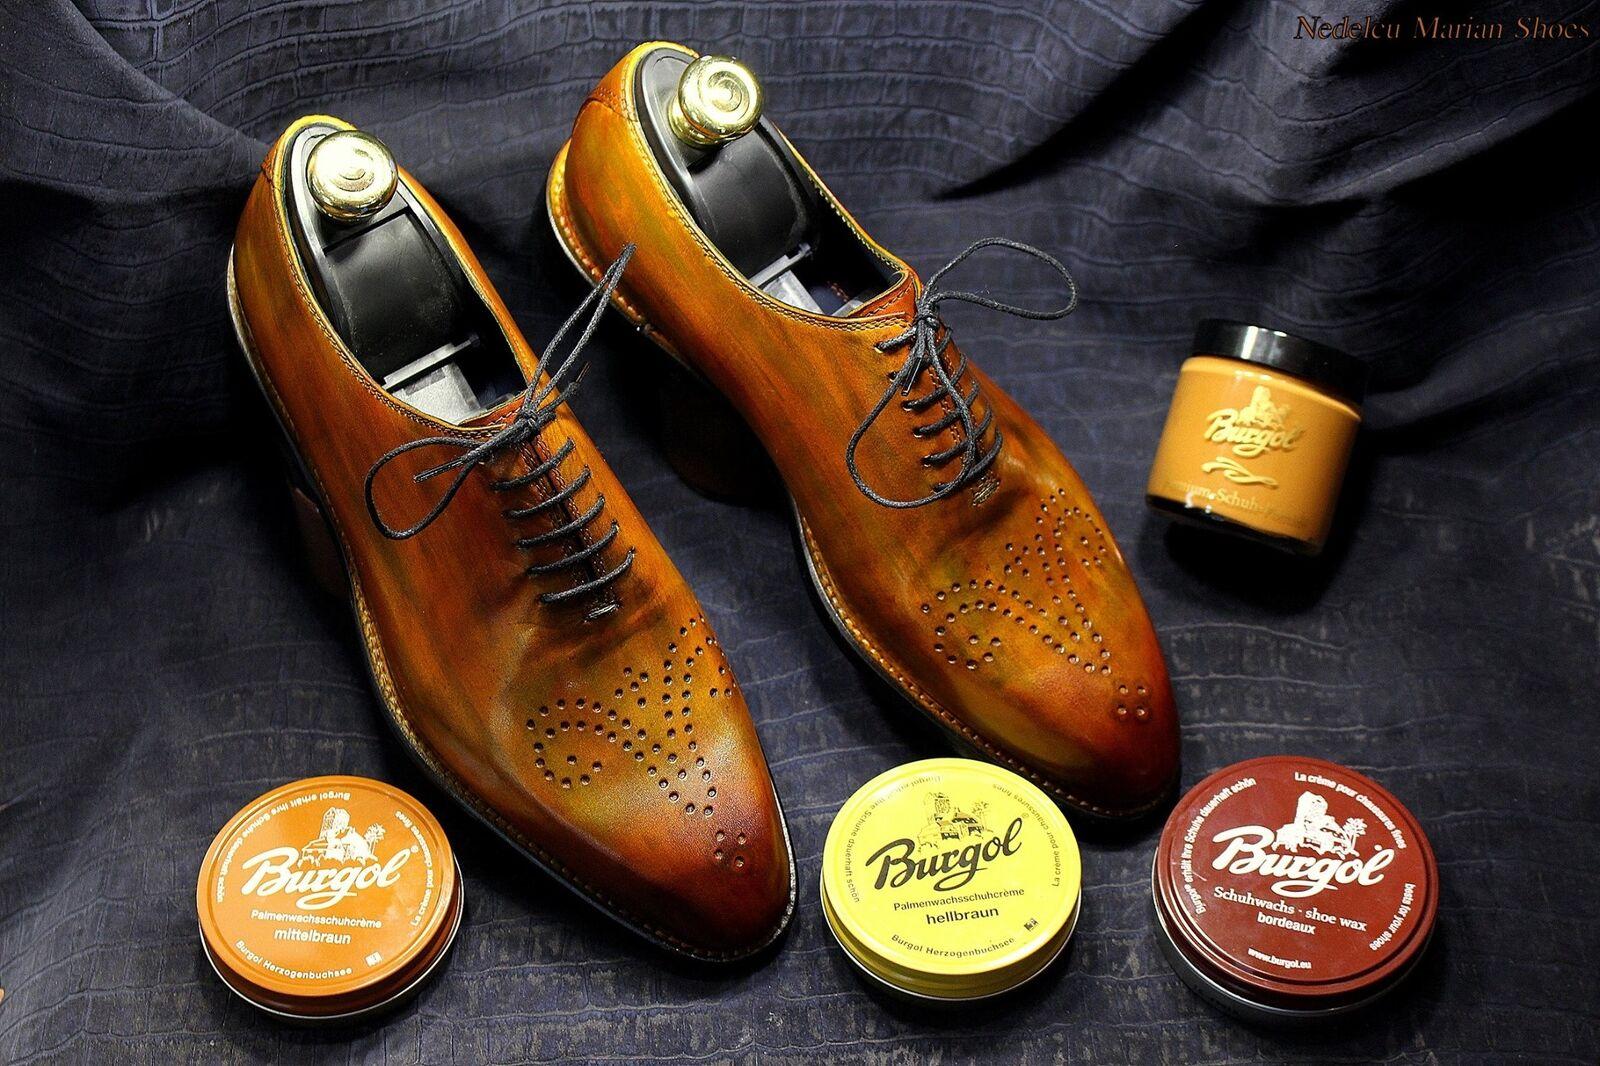 Nedelcu Marian Shoes